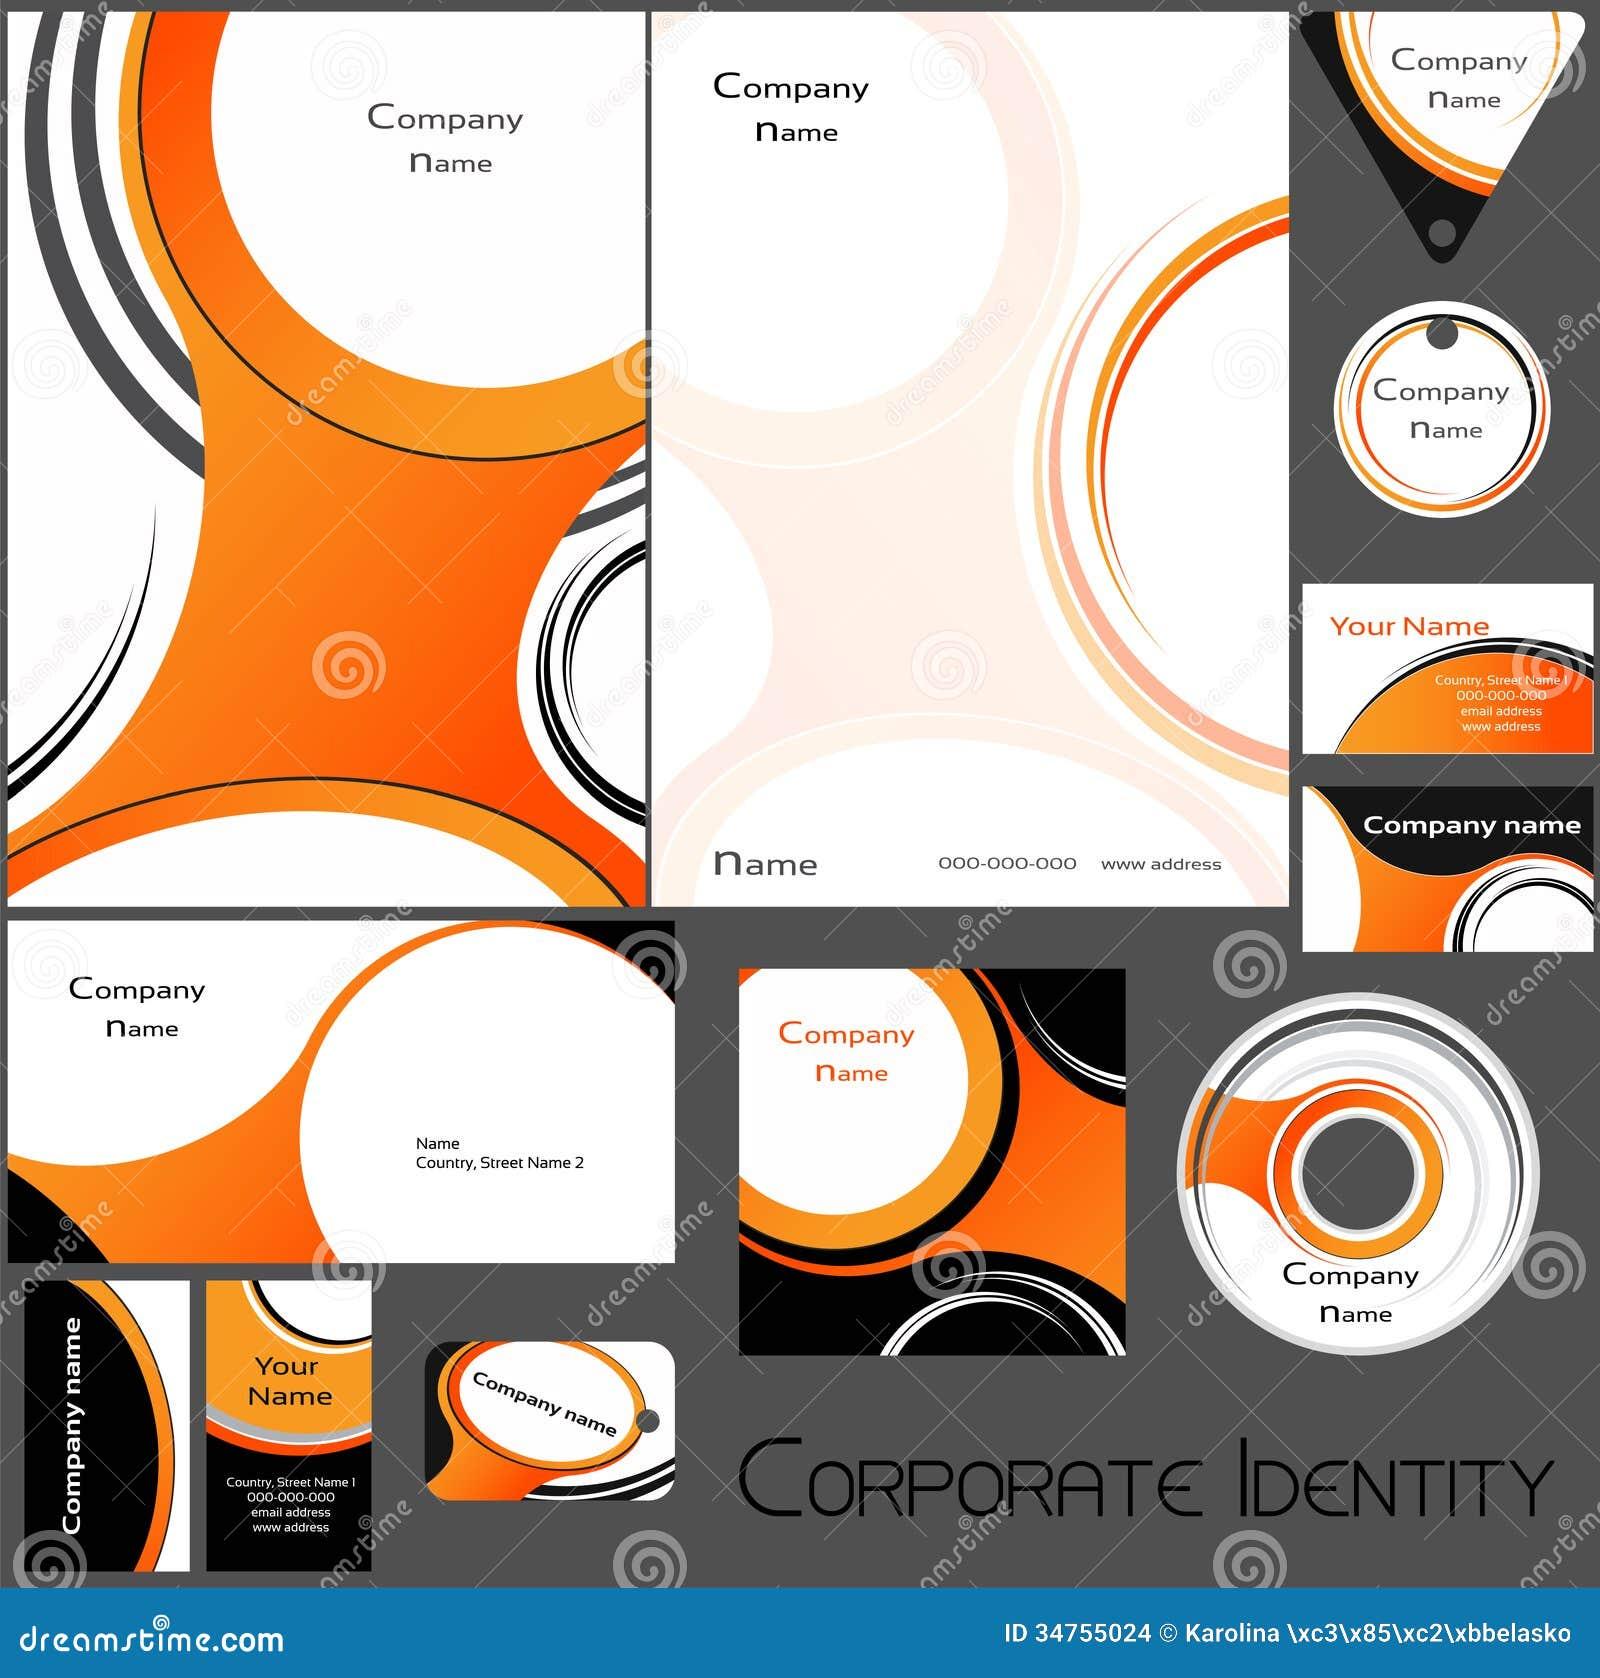 corporate identity template no 15 stock vector image 34755024. Black Bedroom Furniture Sets. Home Design Ideas